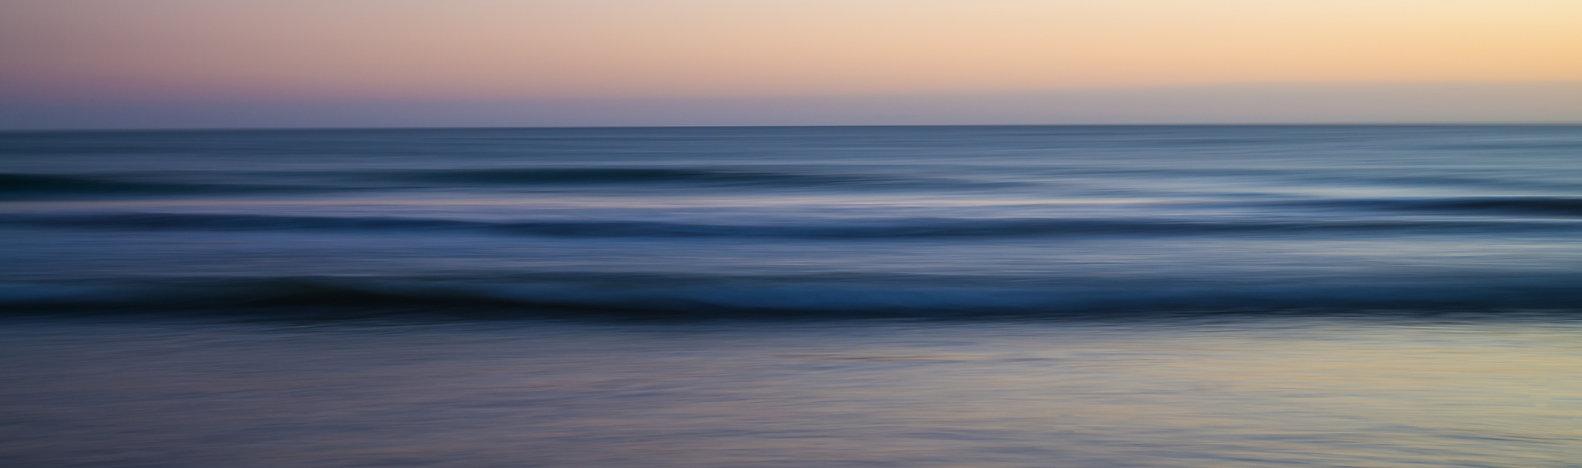 Ocean Beach Panorama .jpg